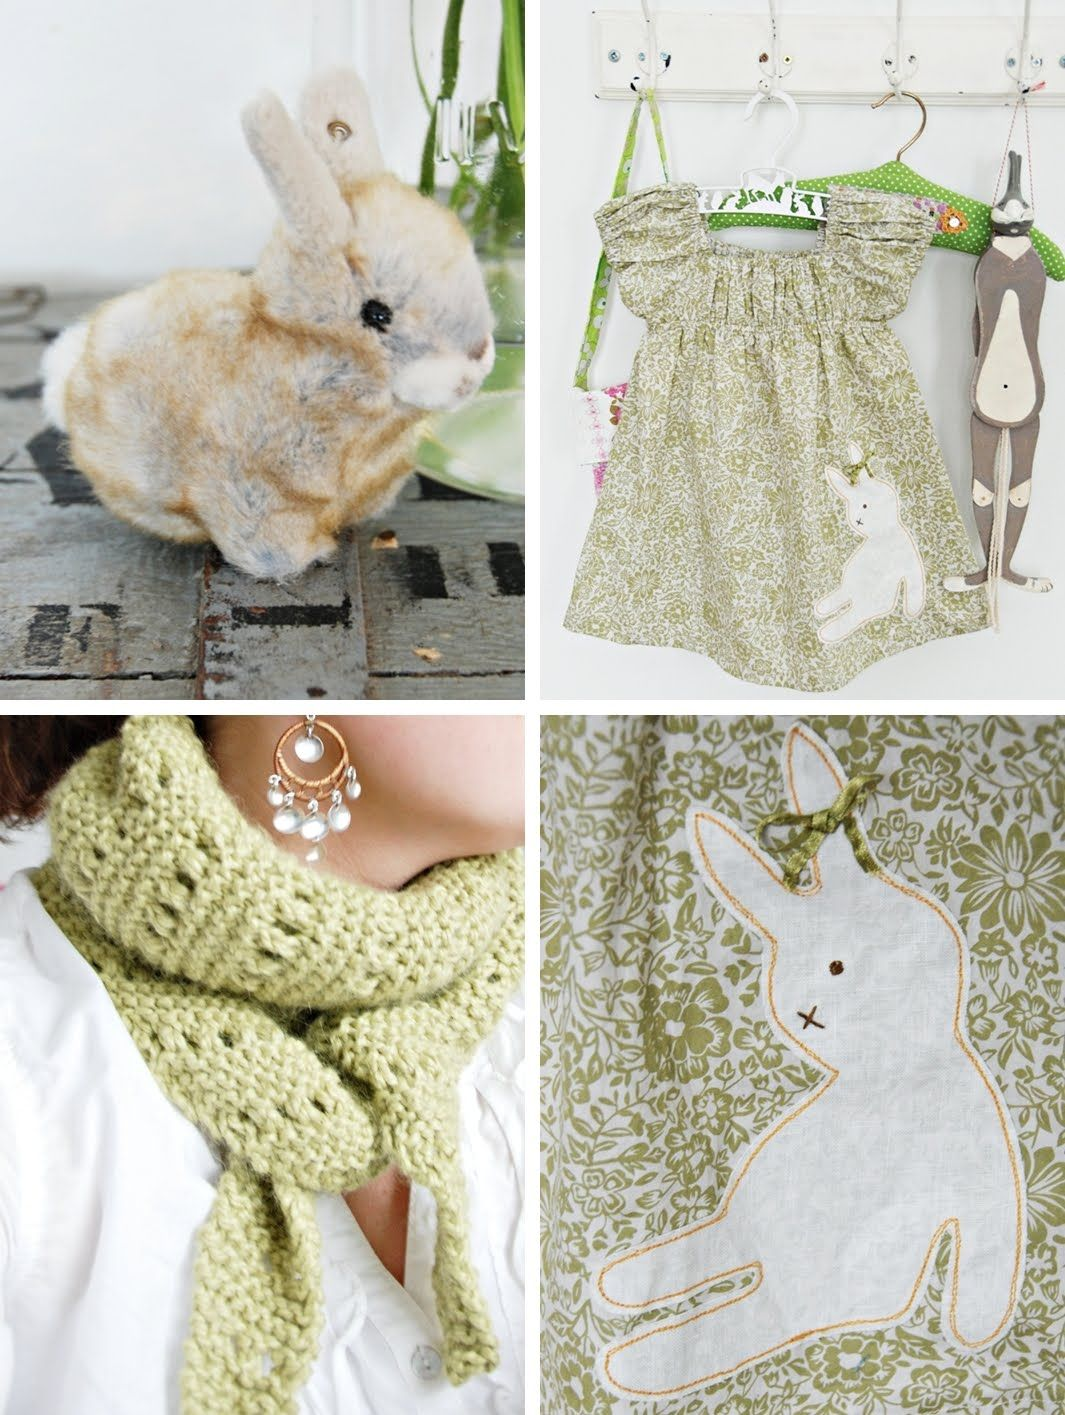 Bunny applique (inspiring)